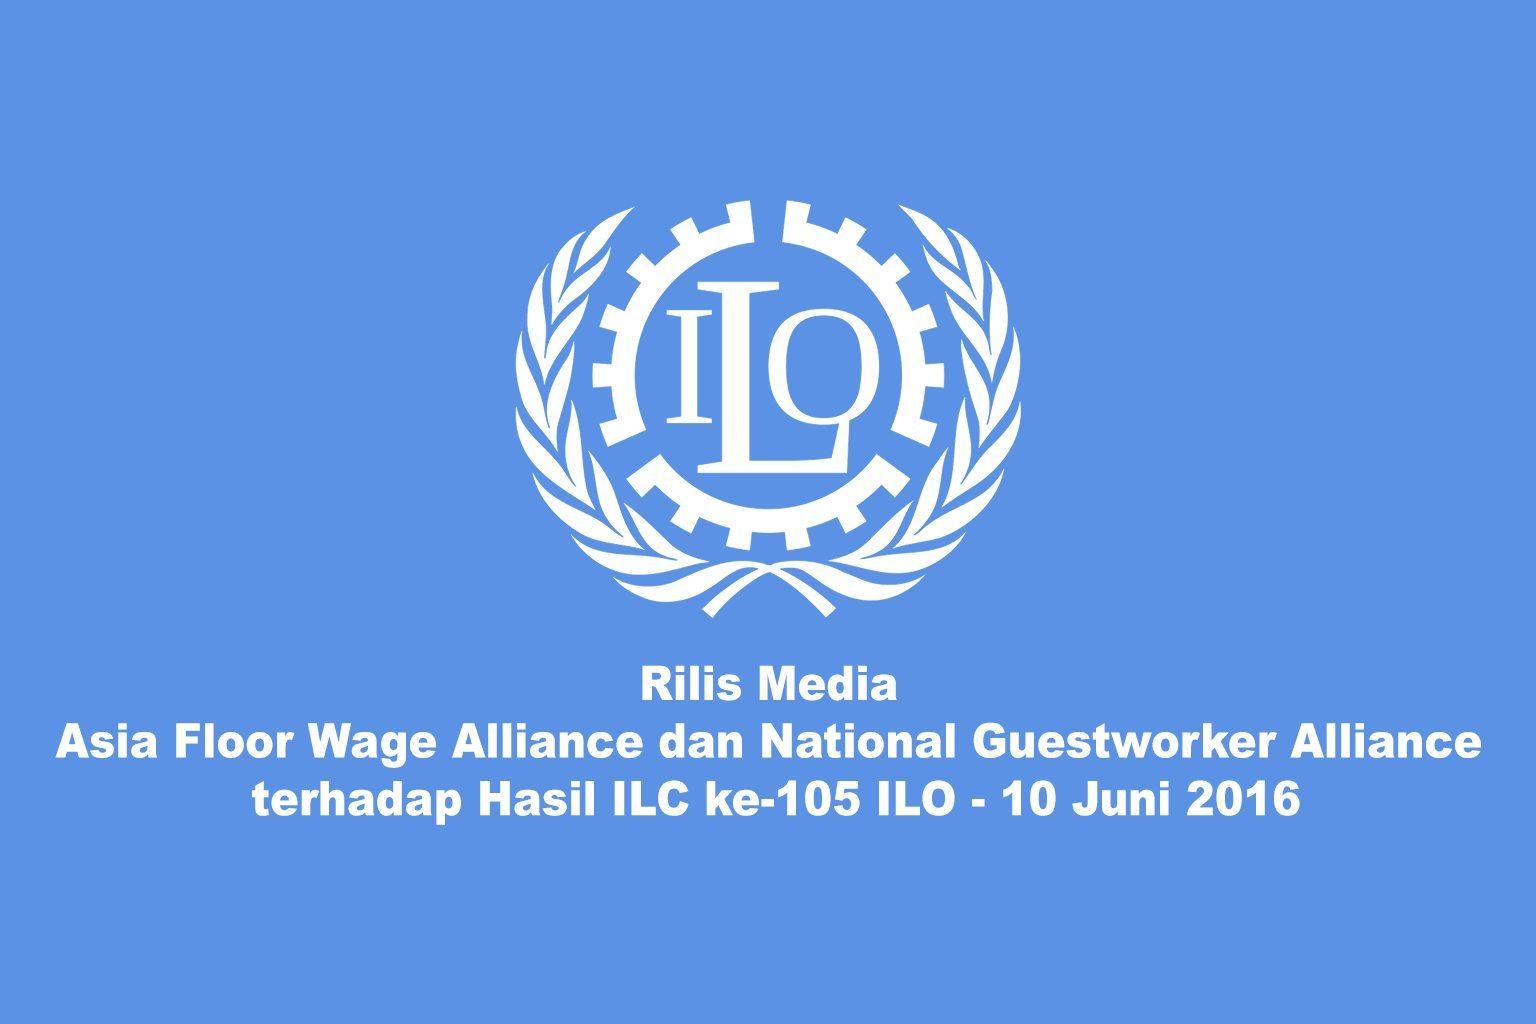 Rilis Media Asia Floor Wage Alliance dan National Guestworker Alliance terhadap Hasil ILC ke-105 ILO 10 Juni 2016